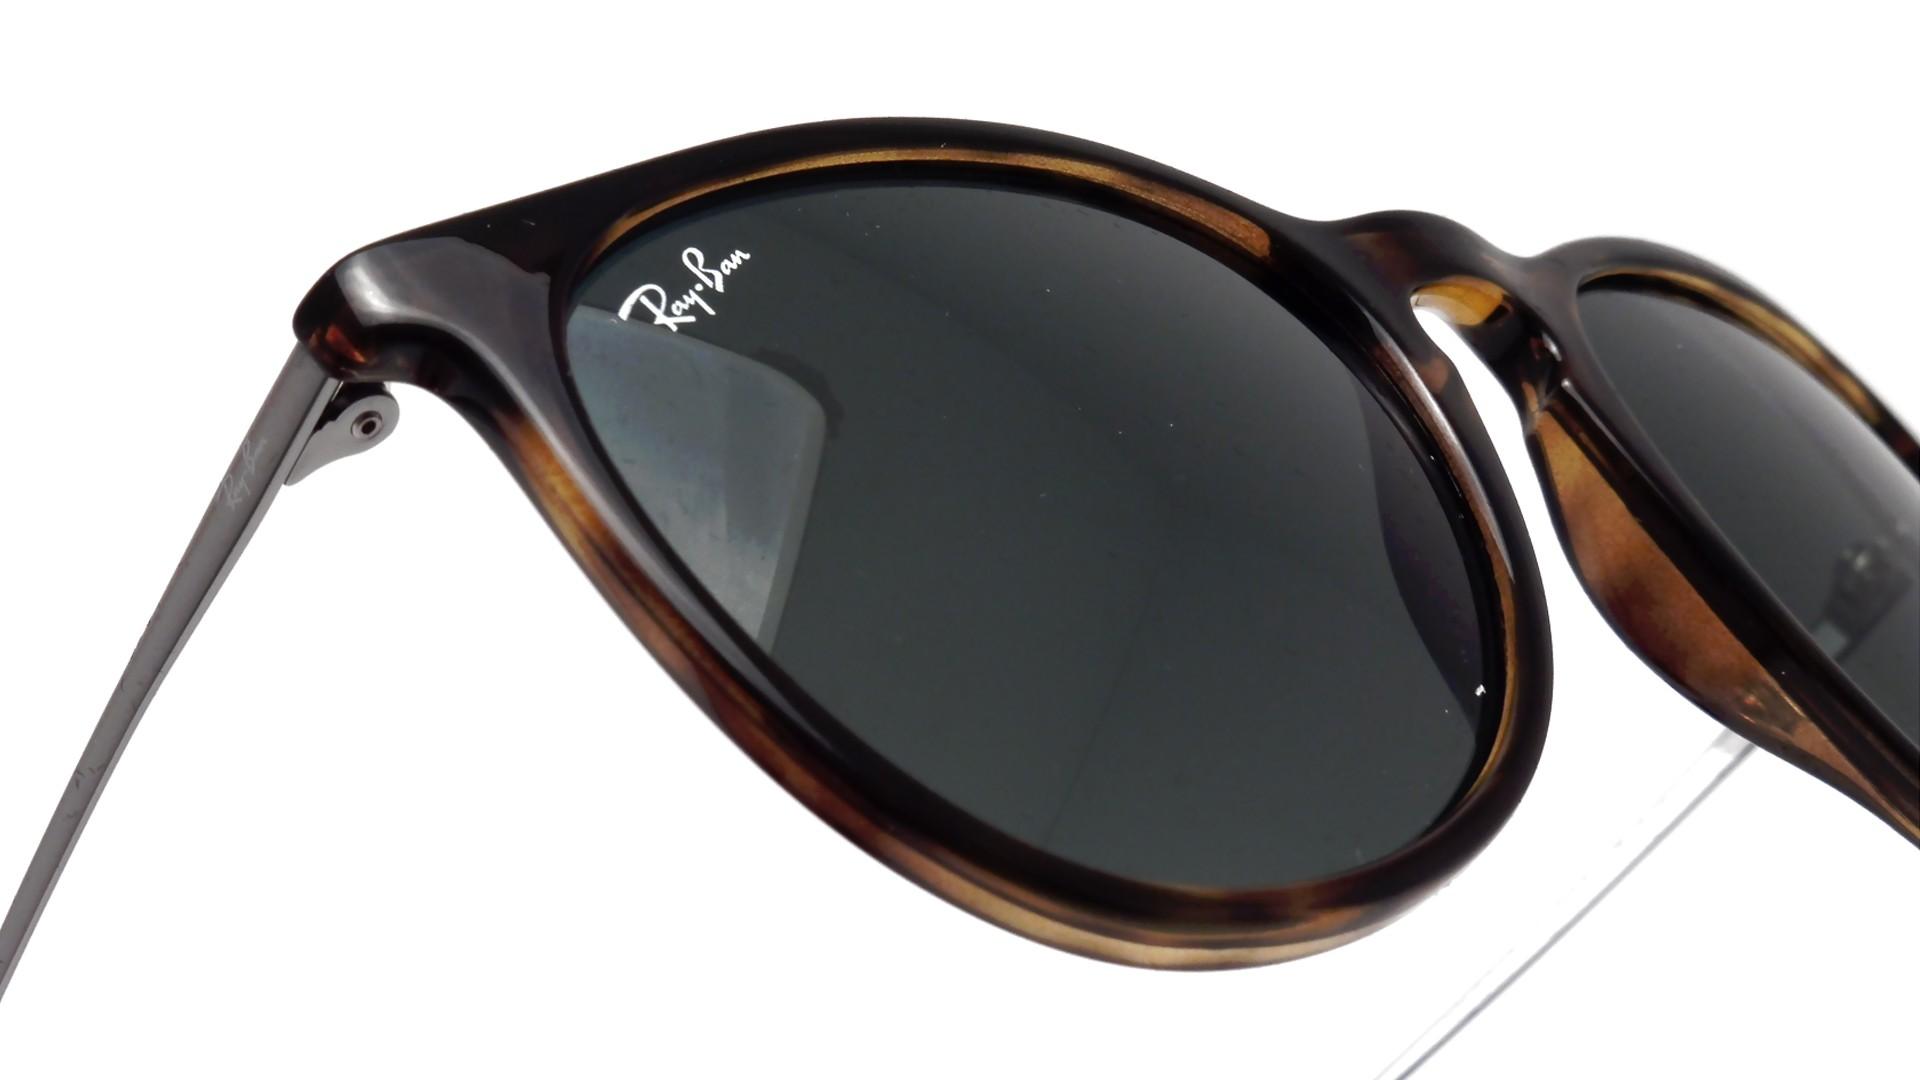 9252a04b5a4 Sunglasses Ray-Ban Erika Tortoise RB4171 710 71 54-18 Medium